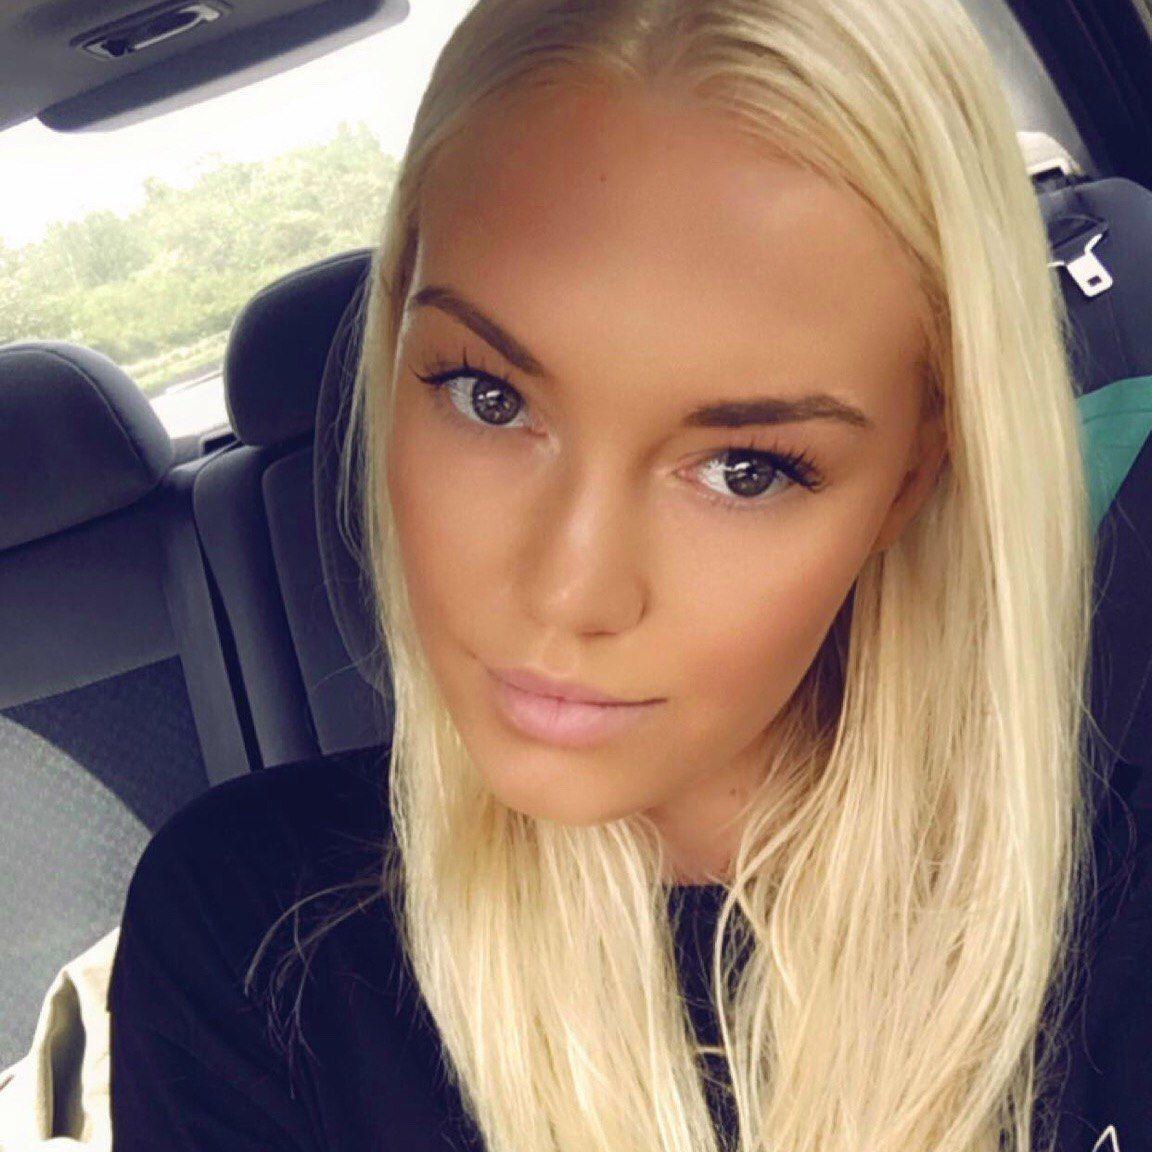 Camilla Velling